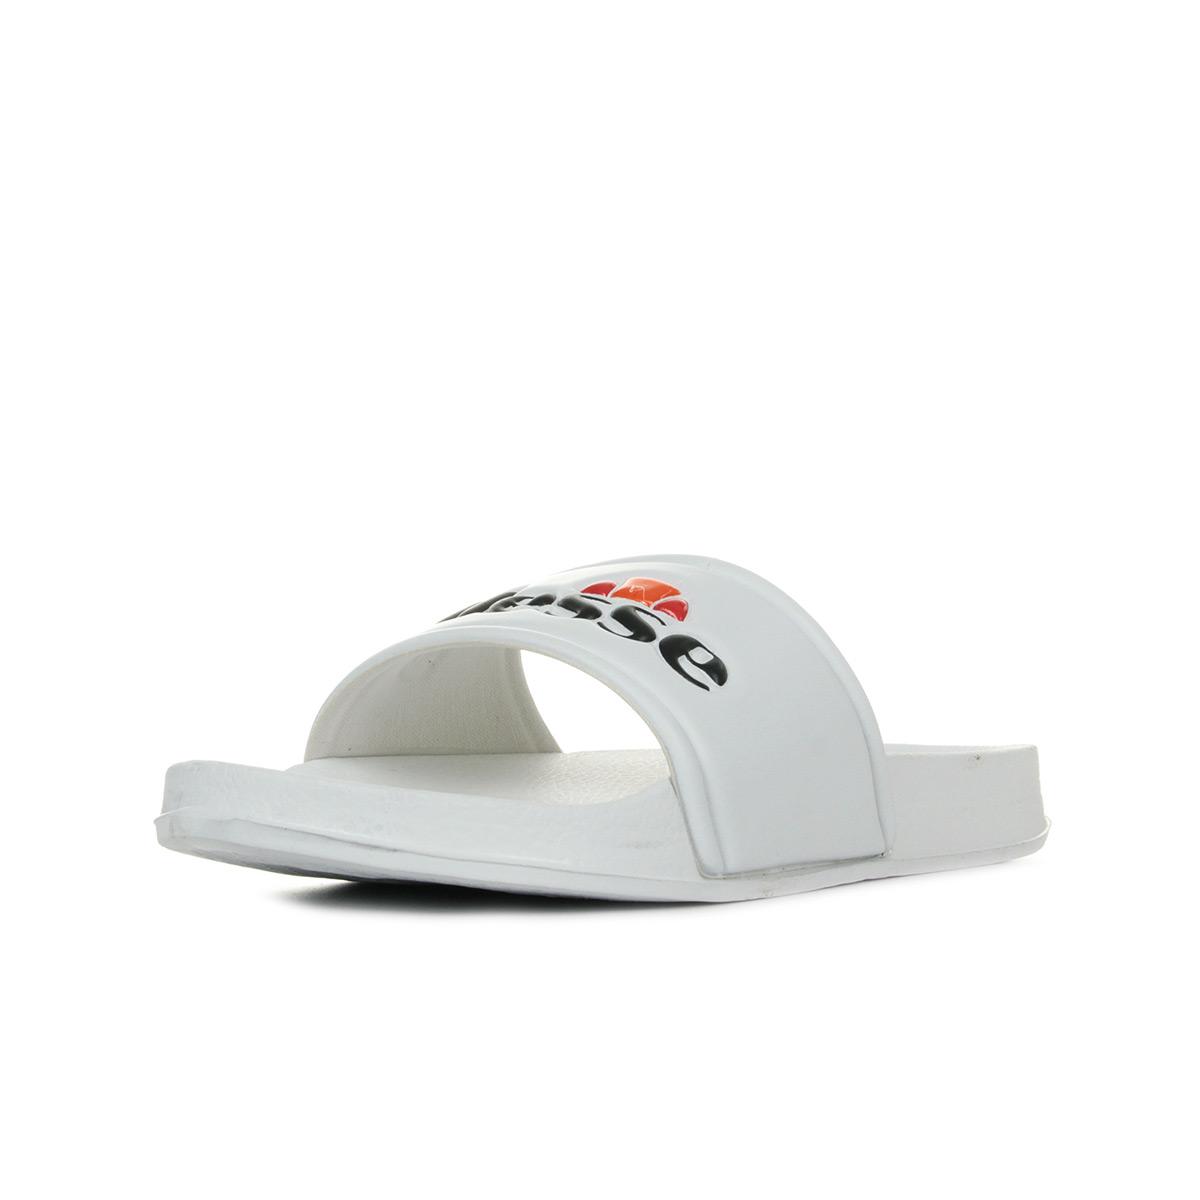 77c53b370255 Ellesse Tong Navy LORETTA PETTINARI Chaussures à lacets femme ...